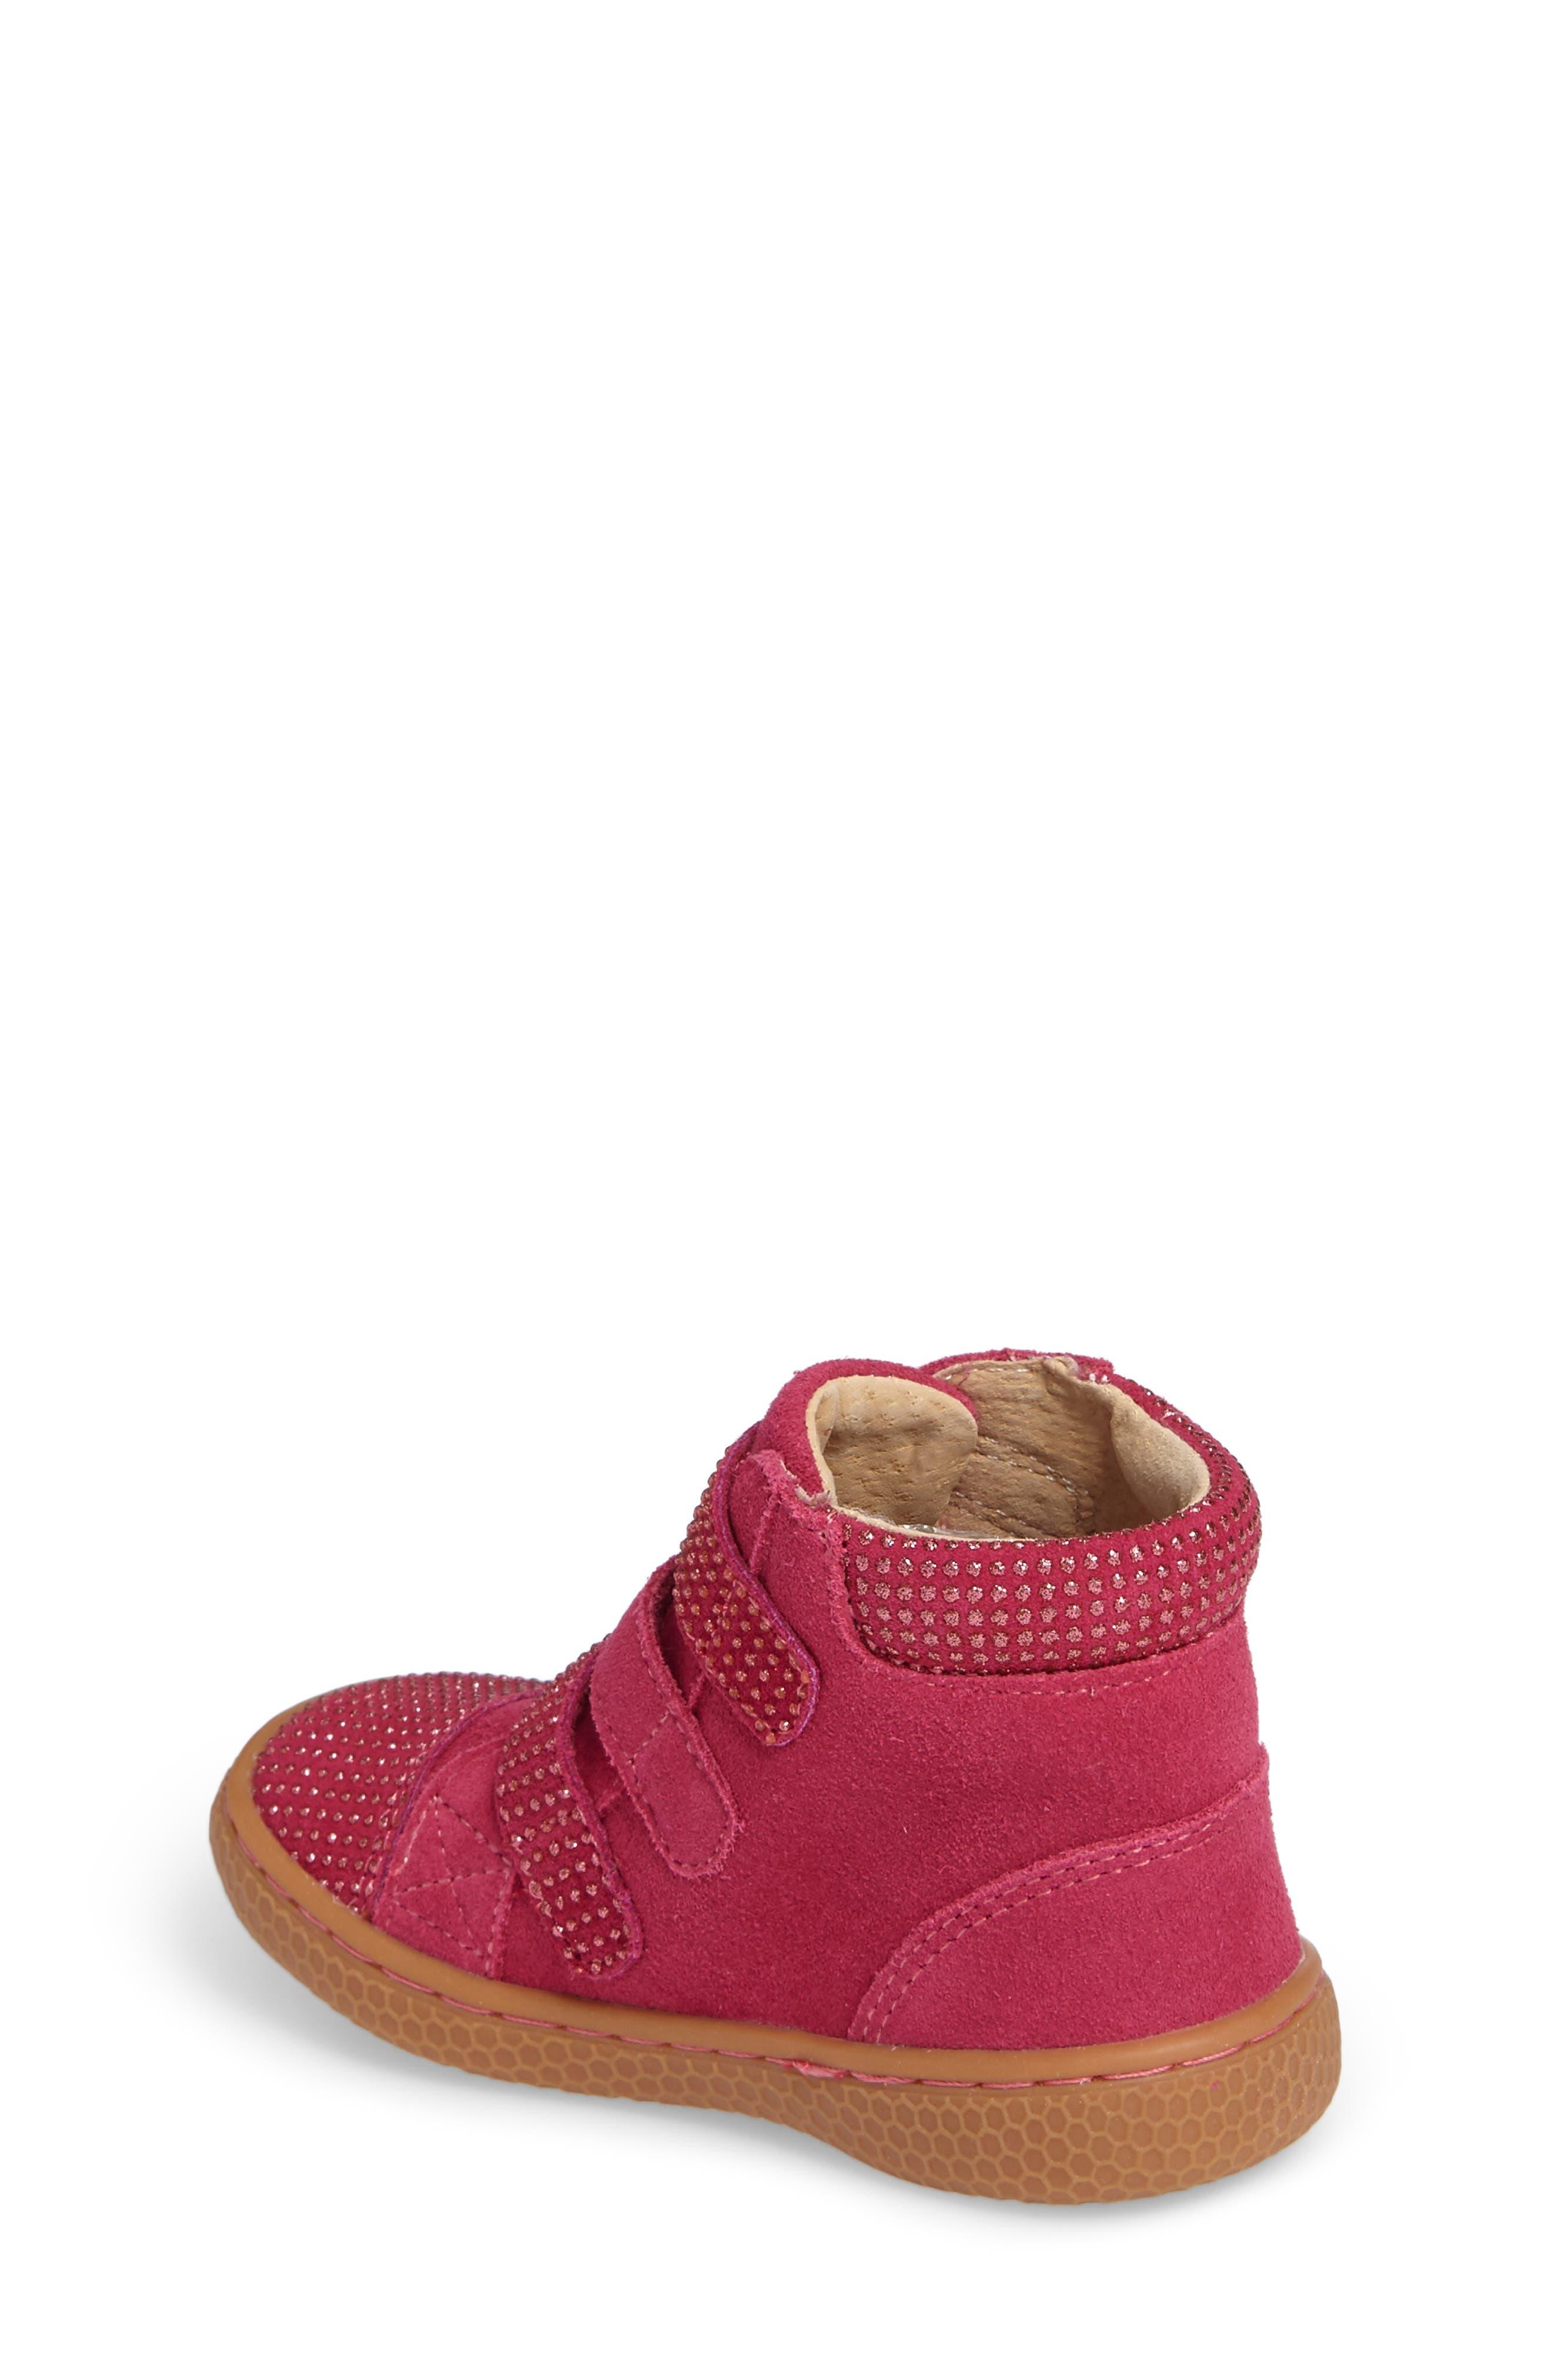 Alternate Image 2  - Livie & Luca 'Jamie' High Top Sneaker (Baby, Walker, Toddler & Little Kid)